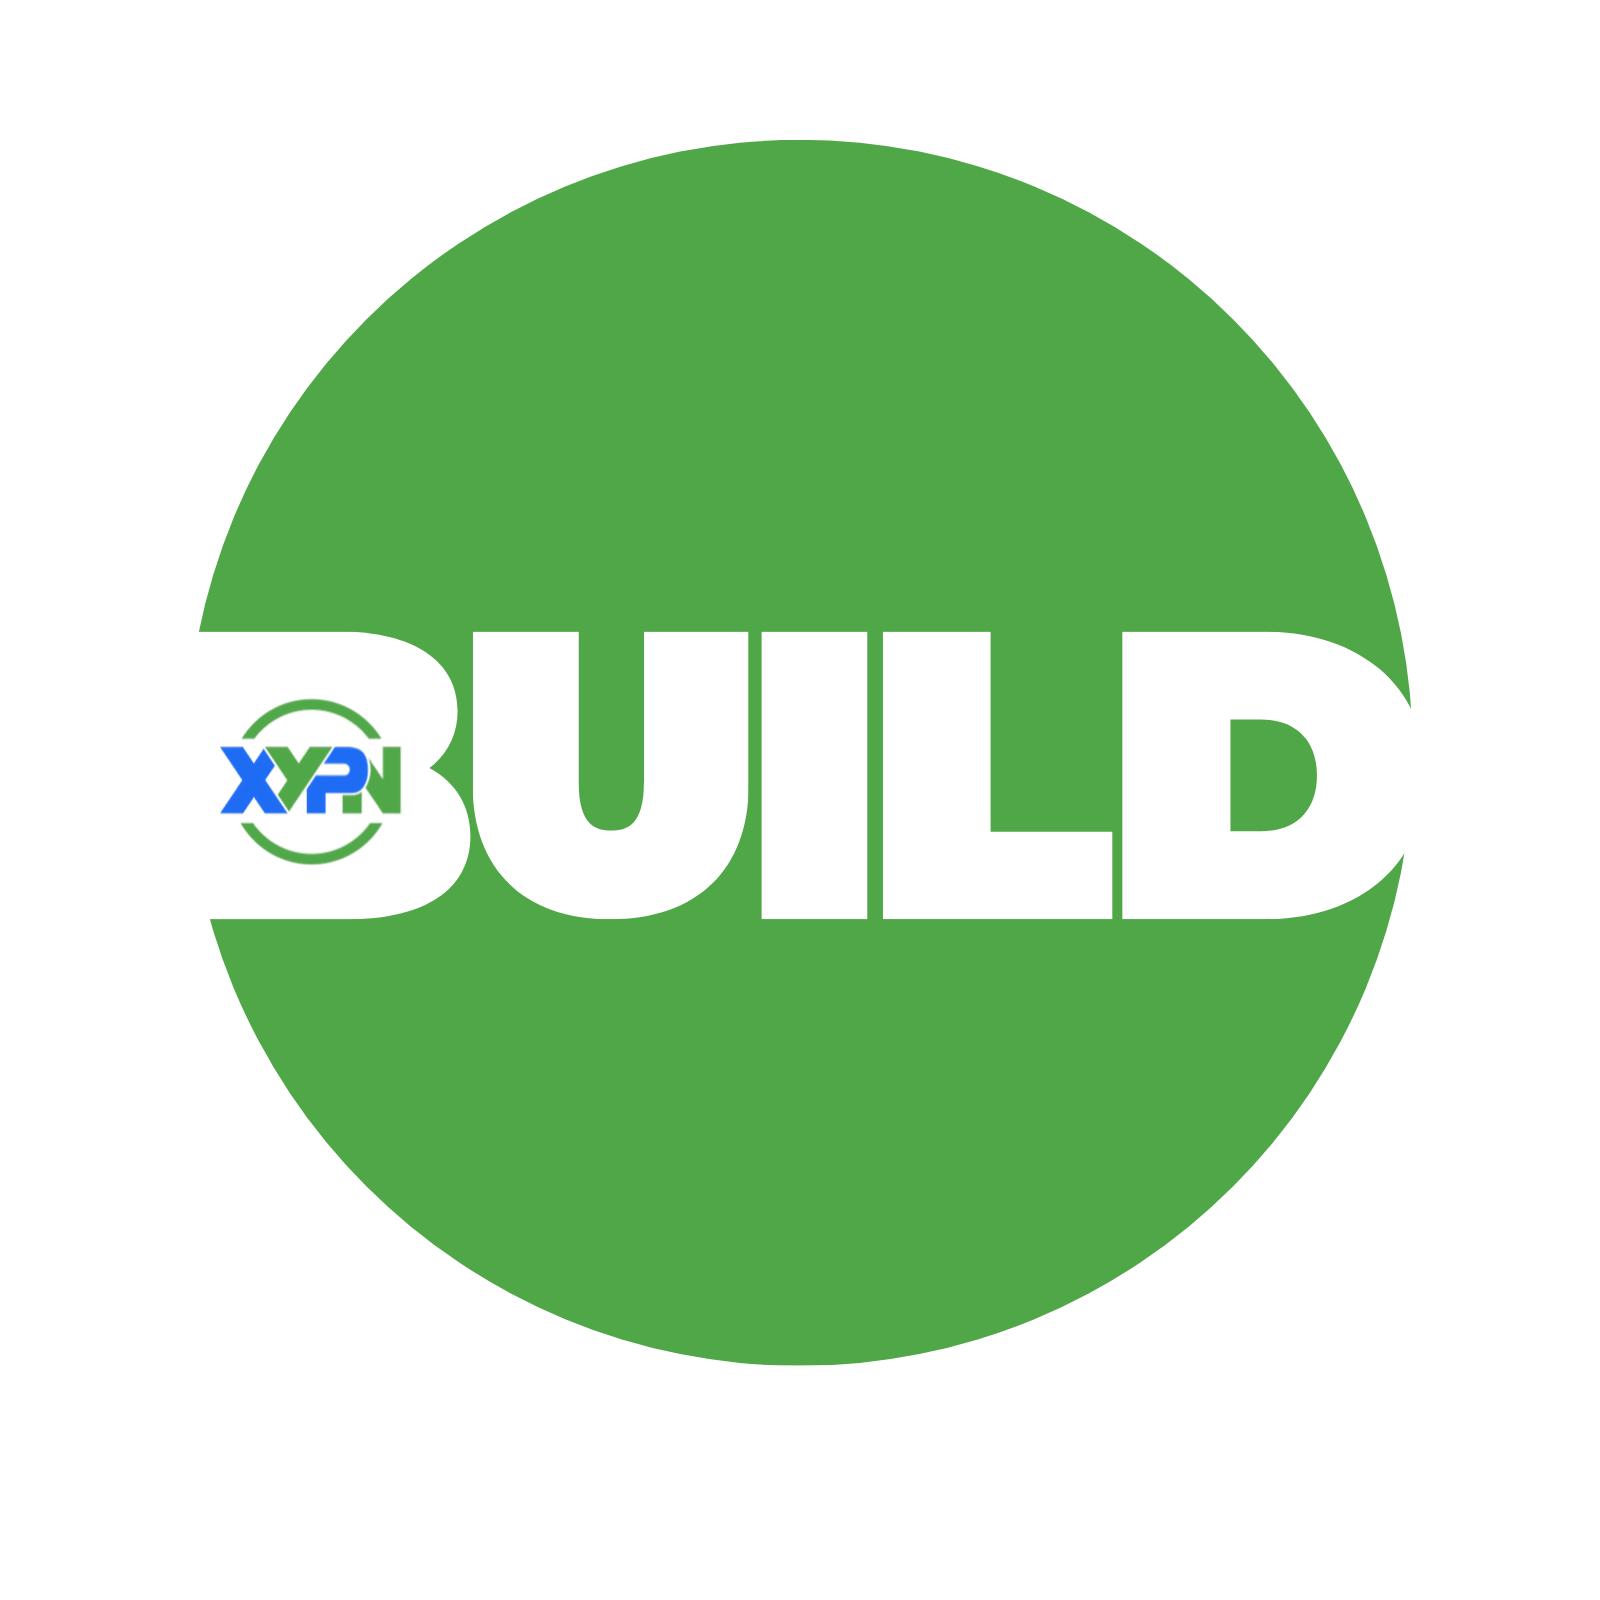 XYPN BUILD